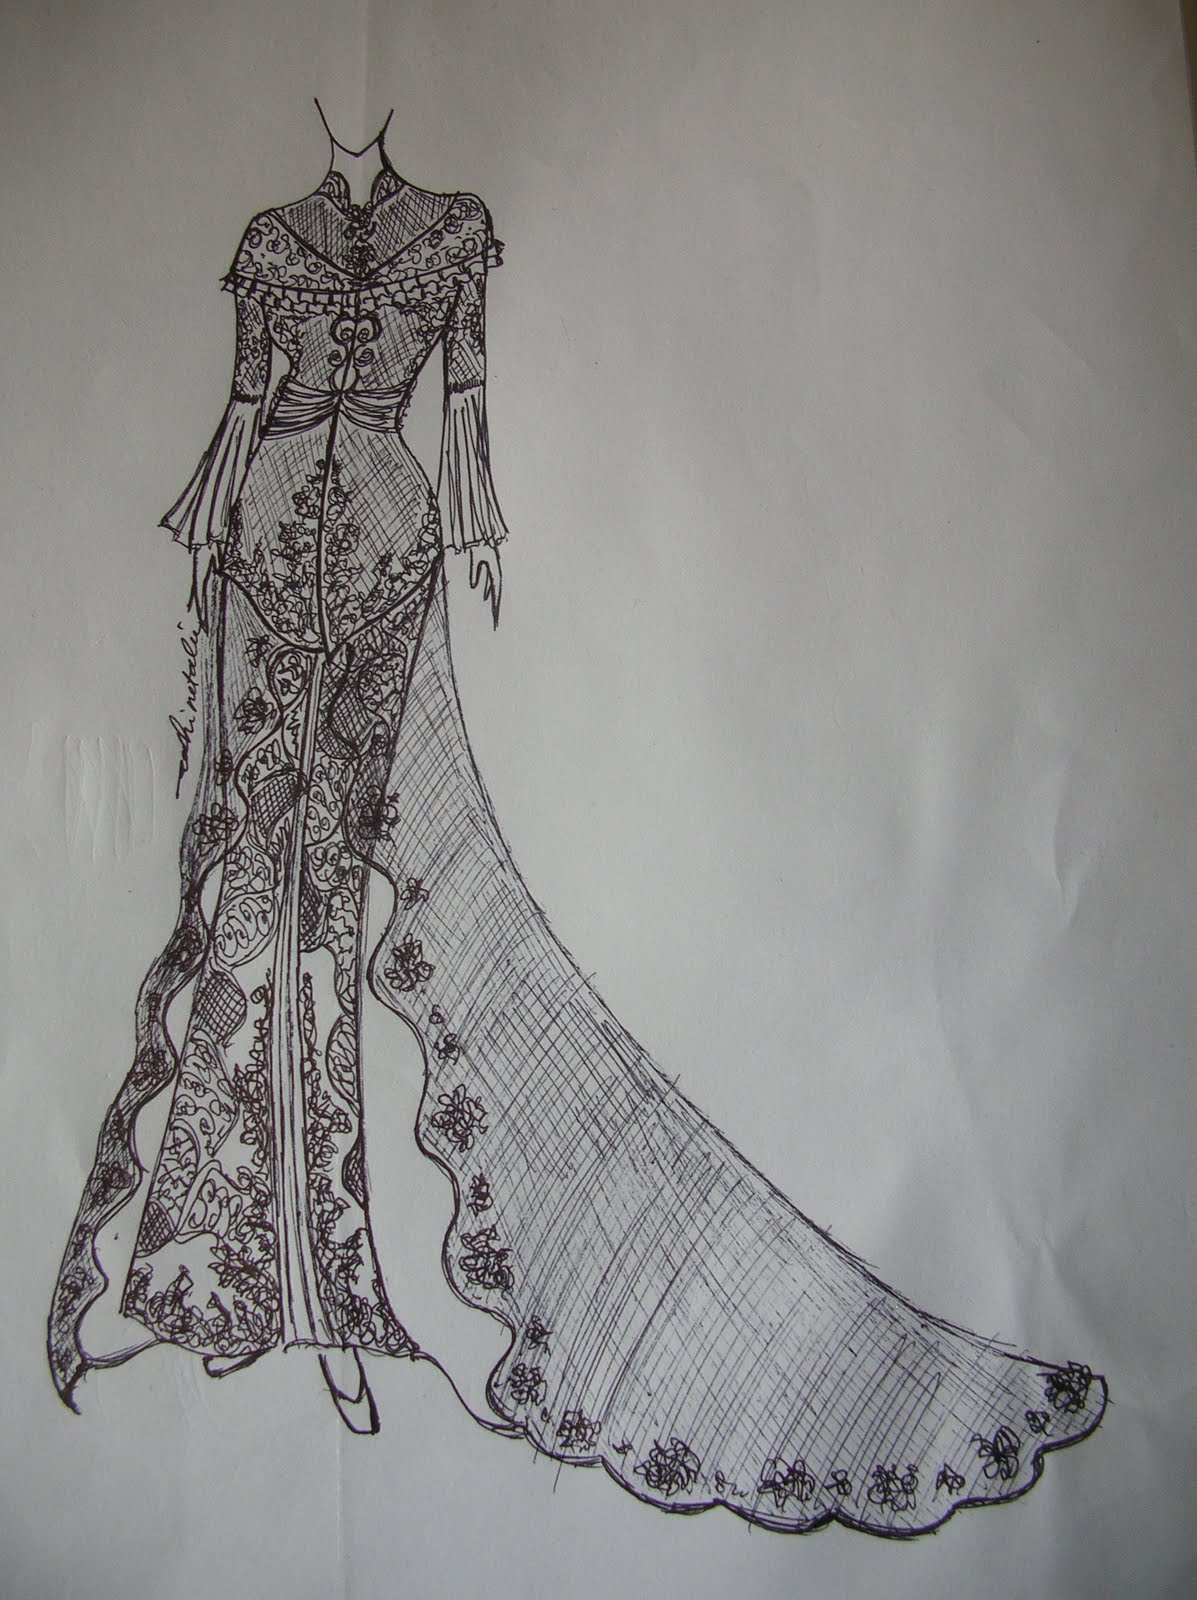 Gambar Desain Baju Long Dress  Koleksi Gambar HD